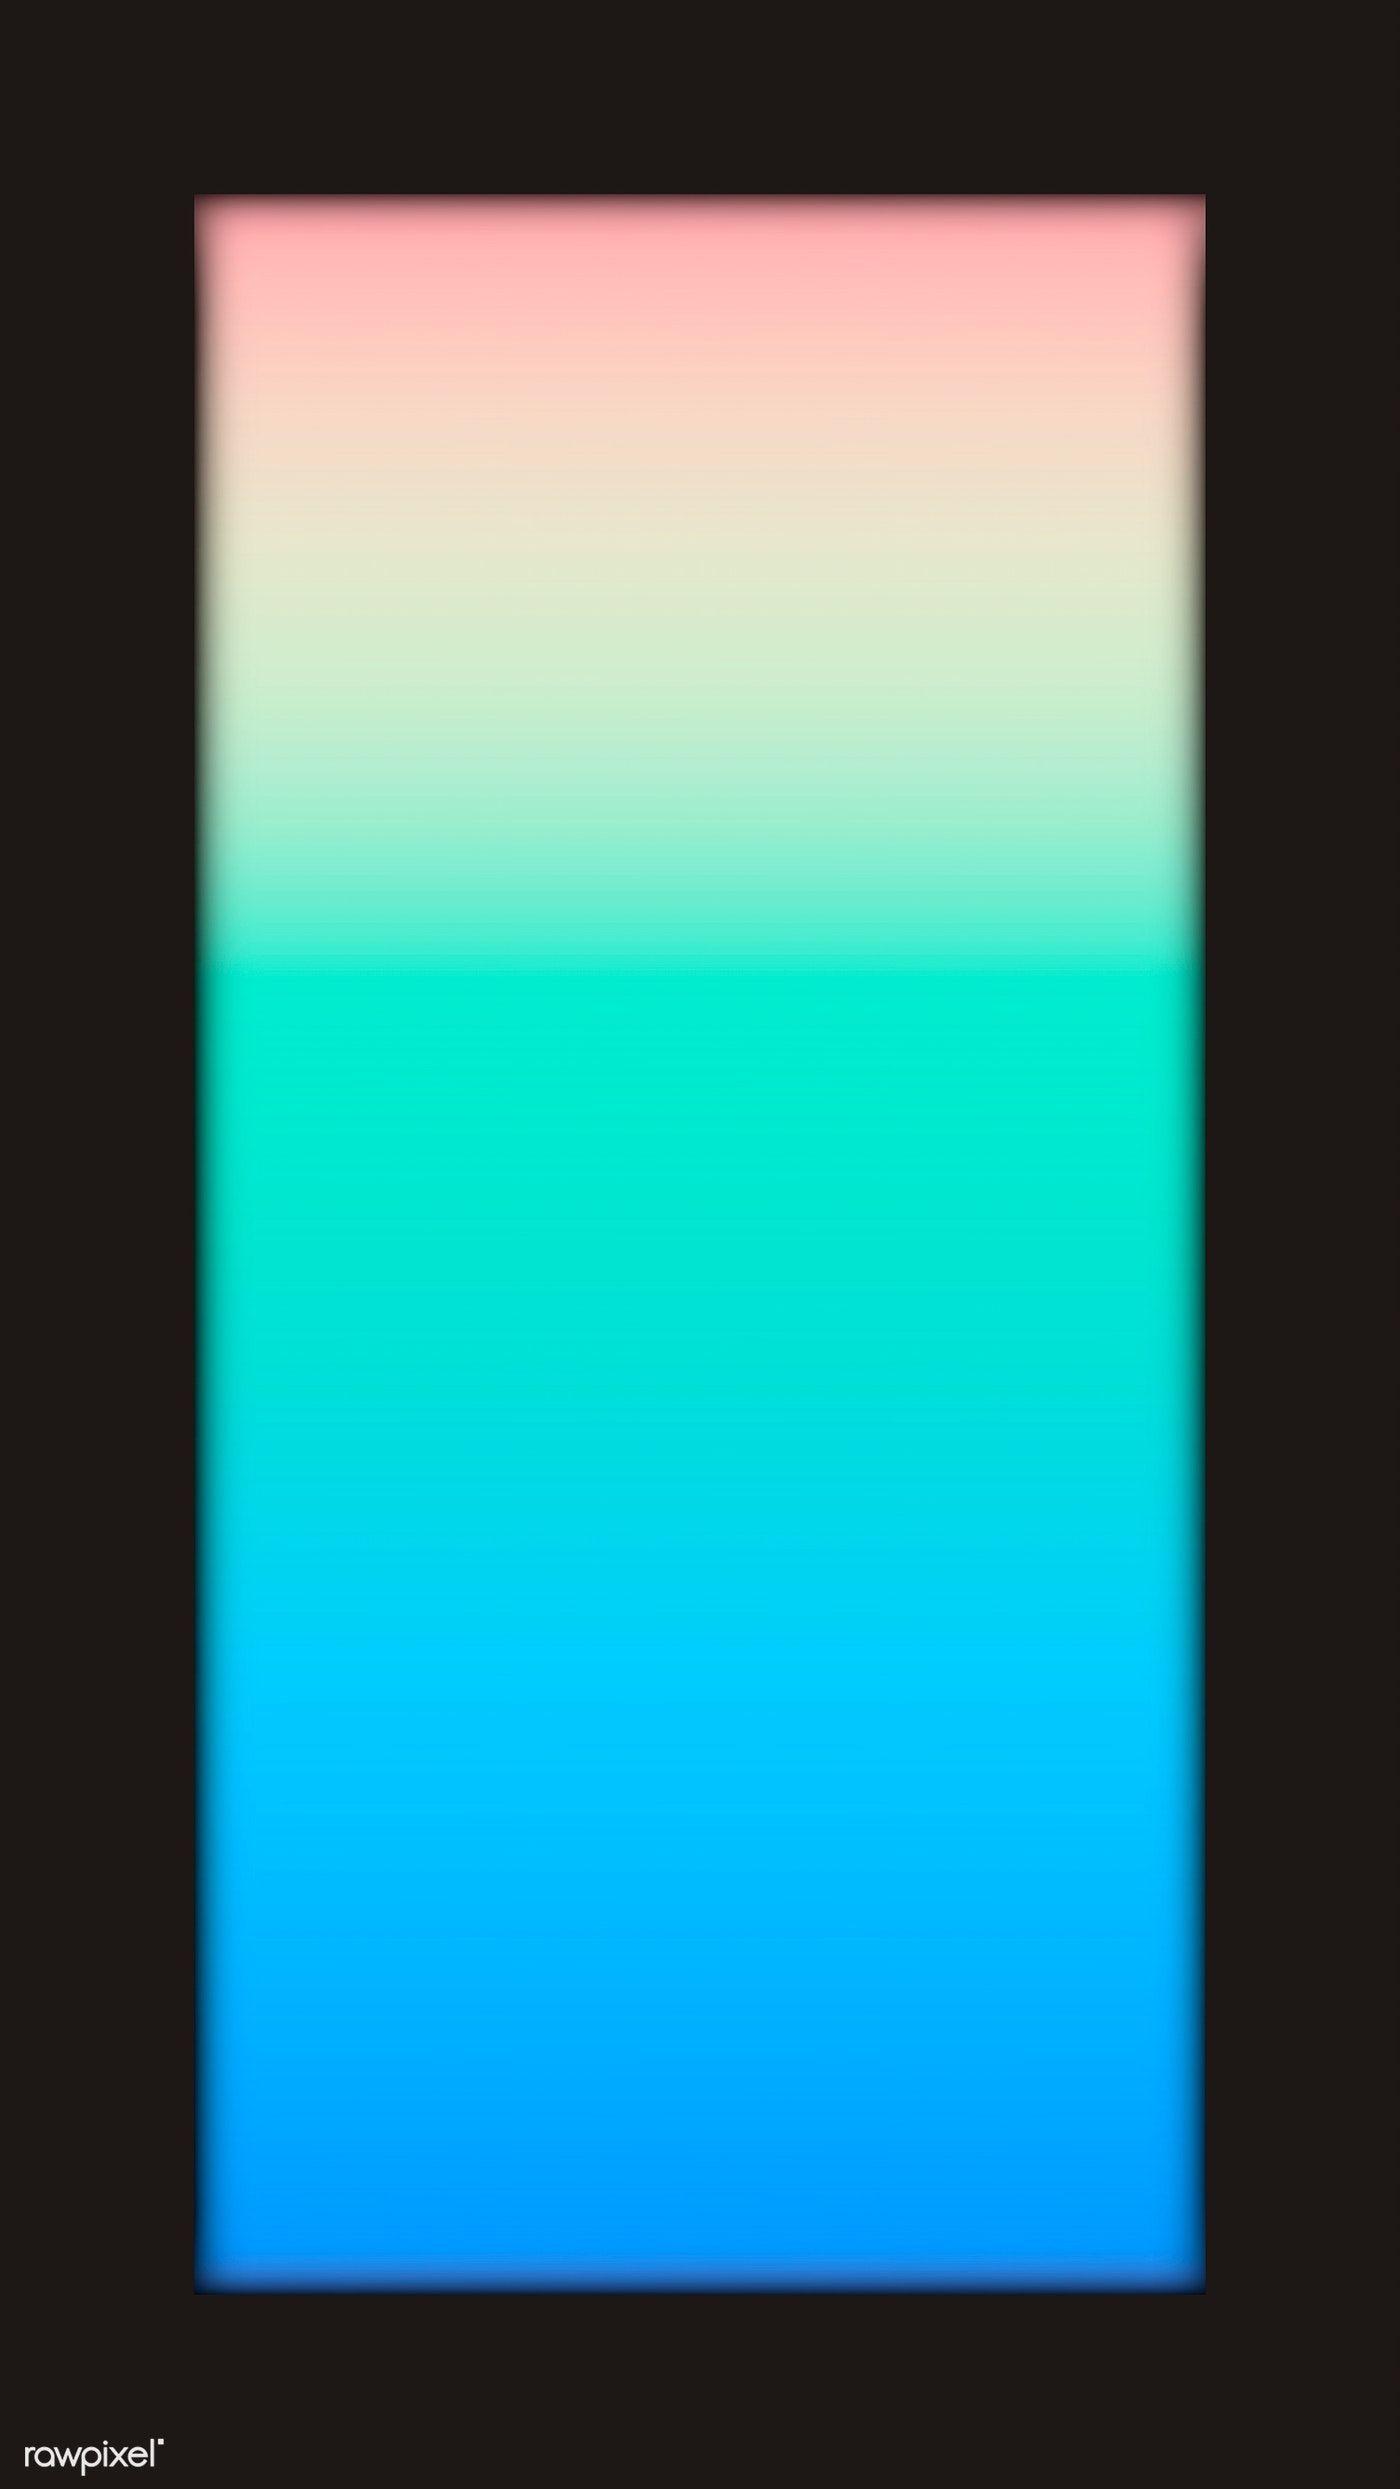 Background Aesthetic Pastel Green - HD Wallpaper